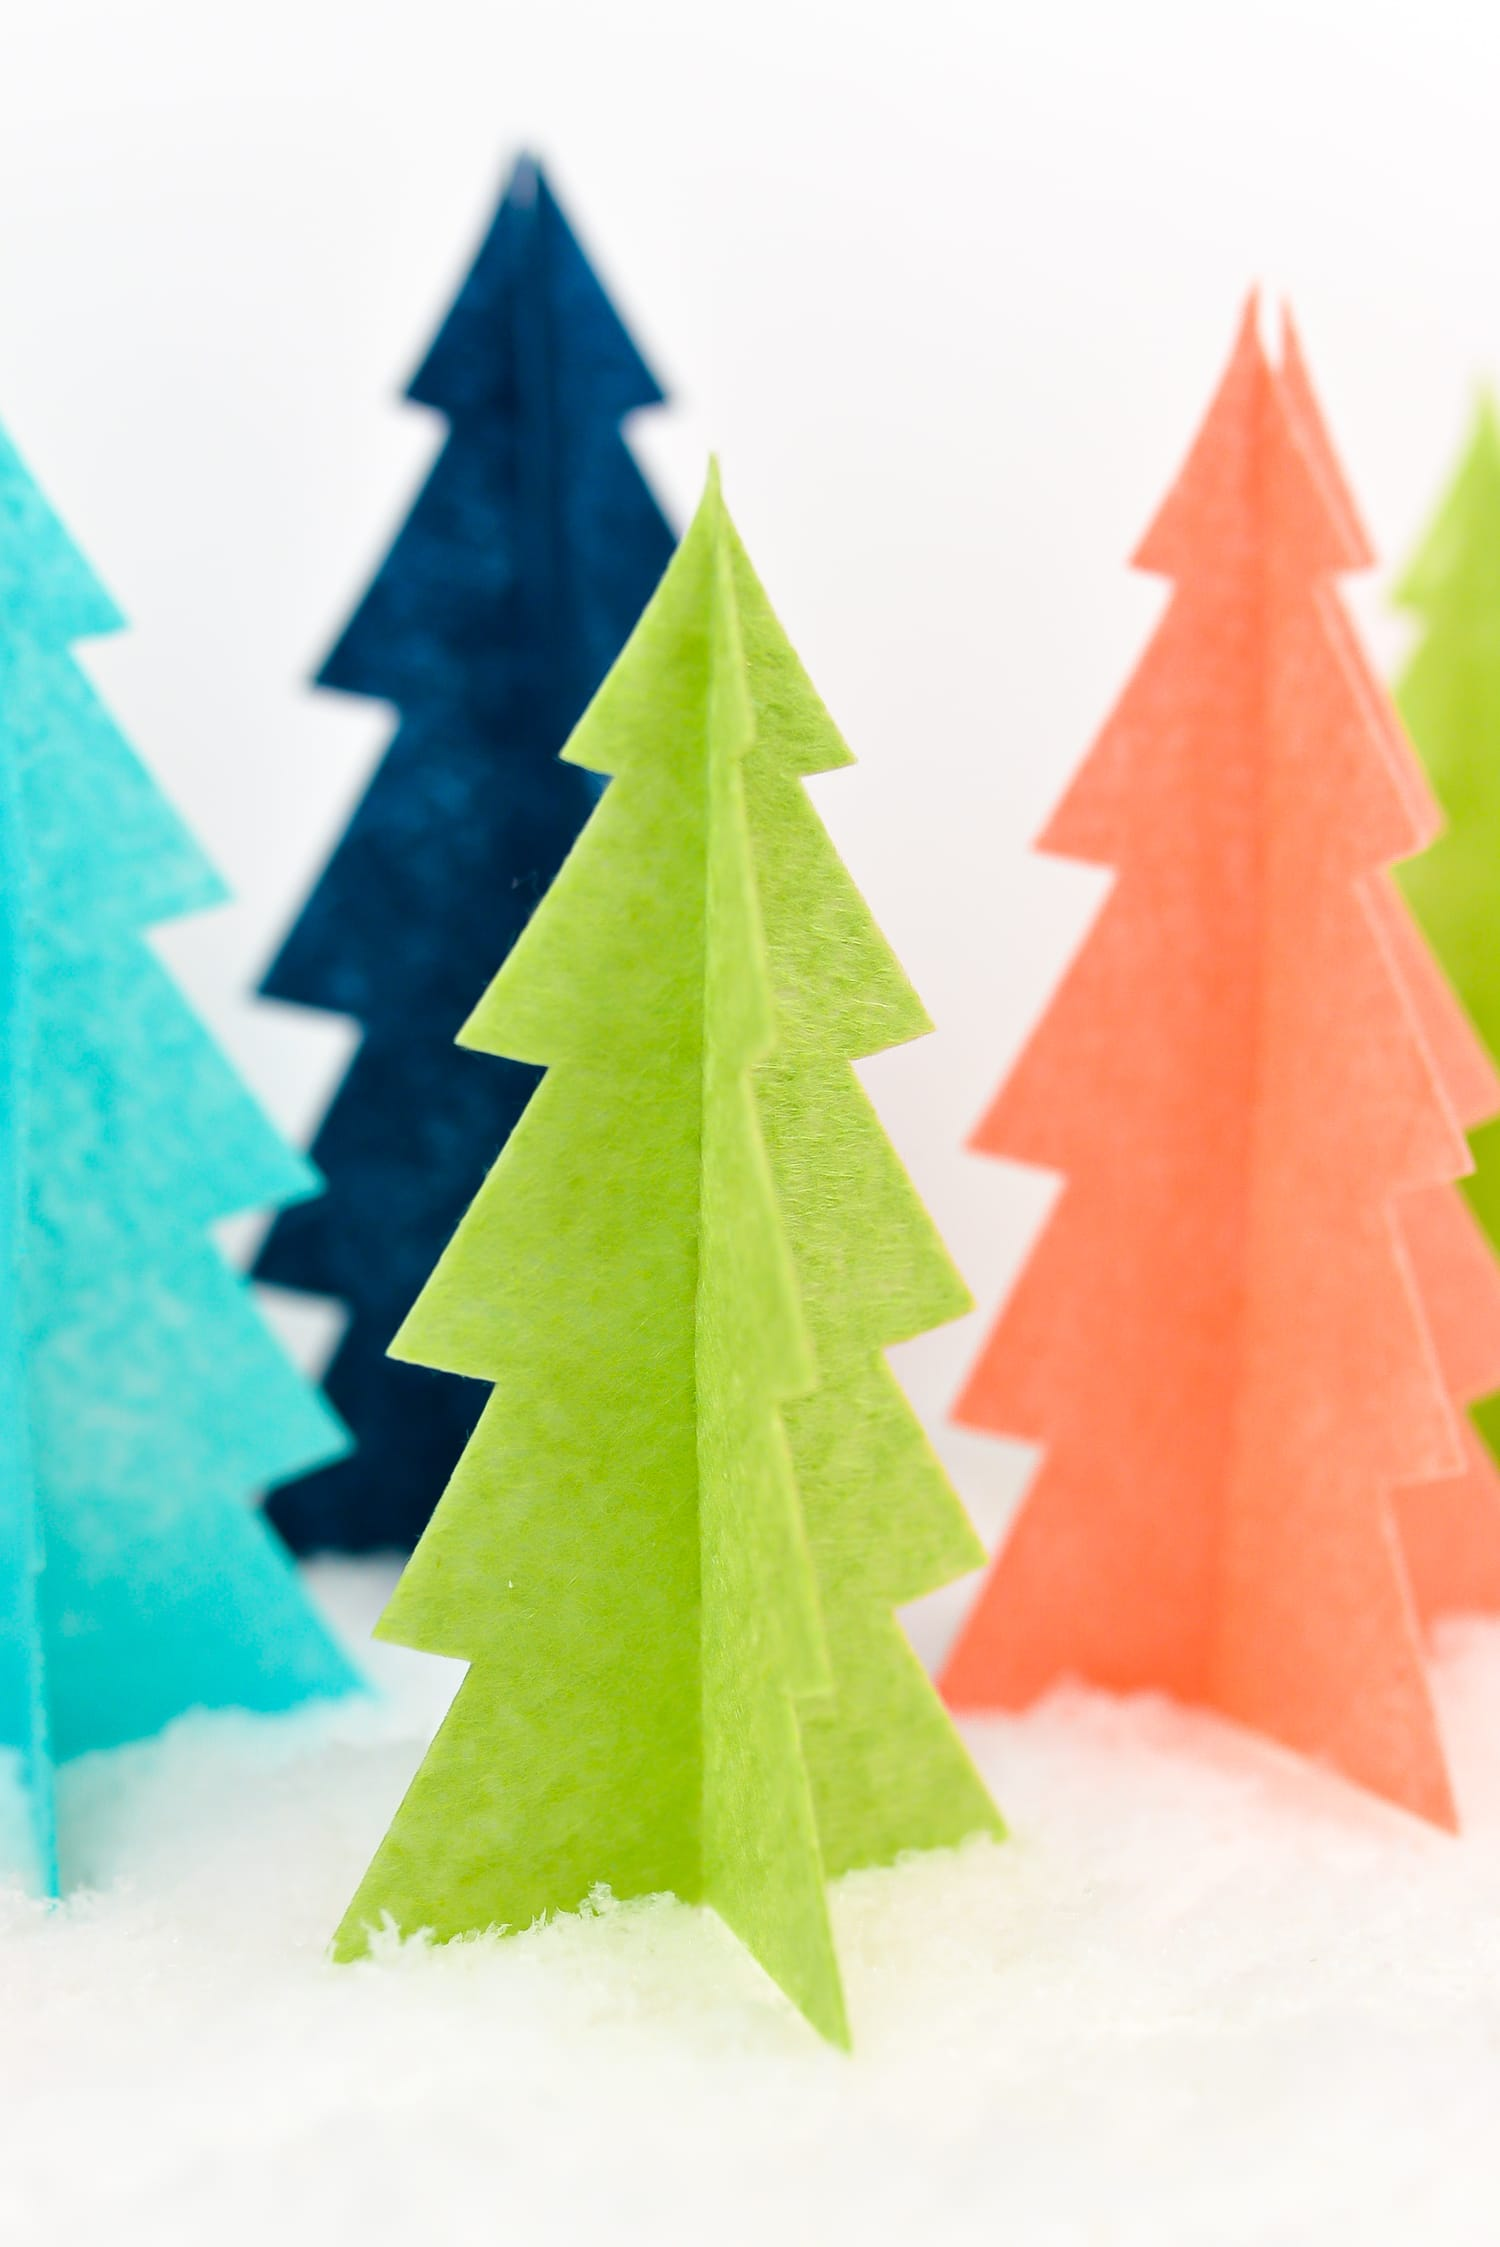 colorful felt Christmas trees made with Cricut